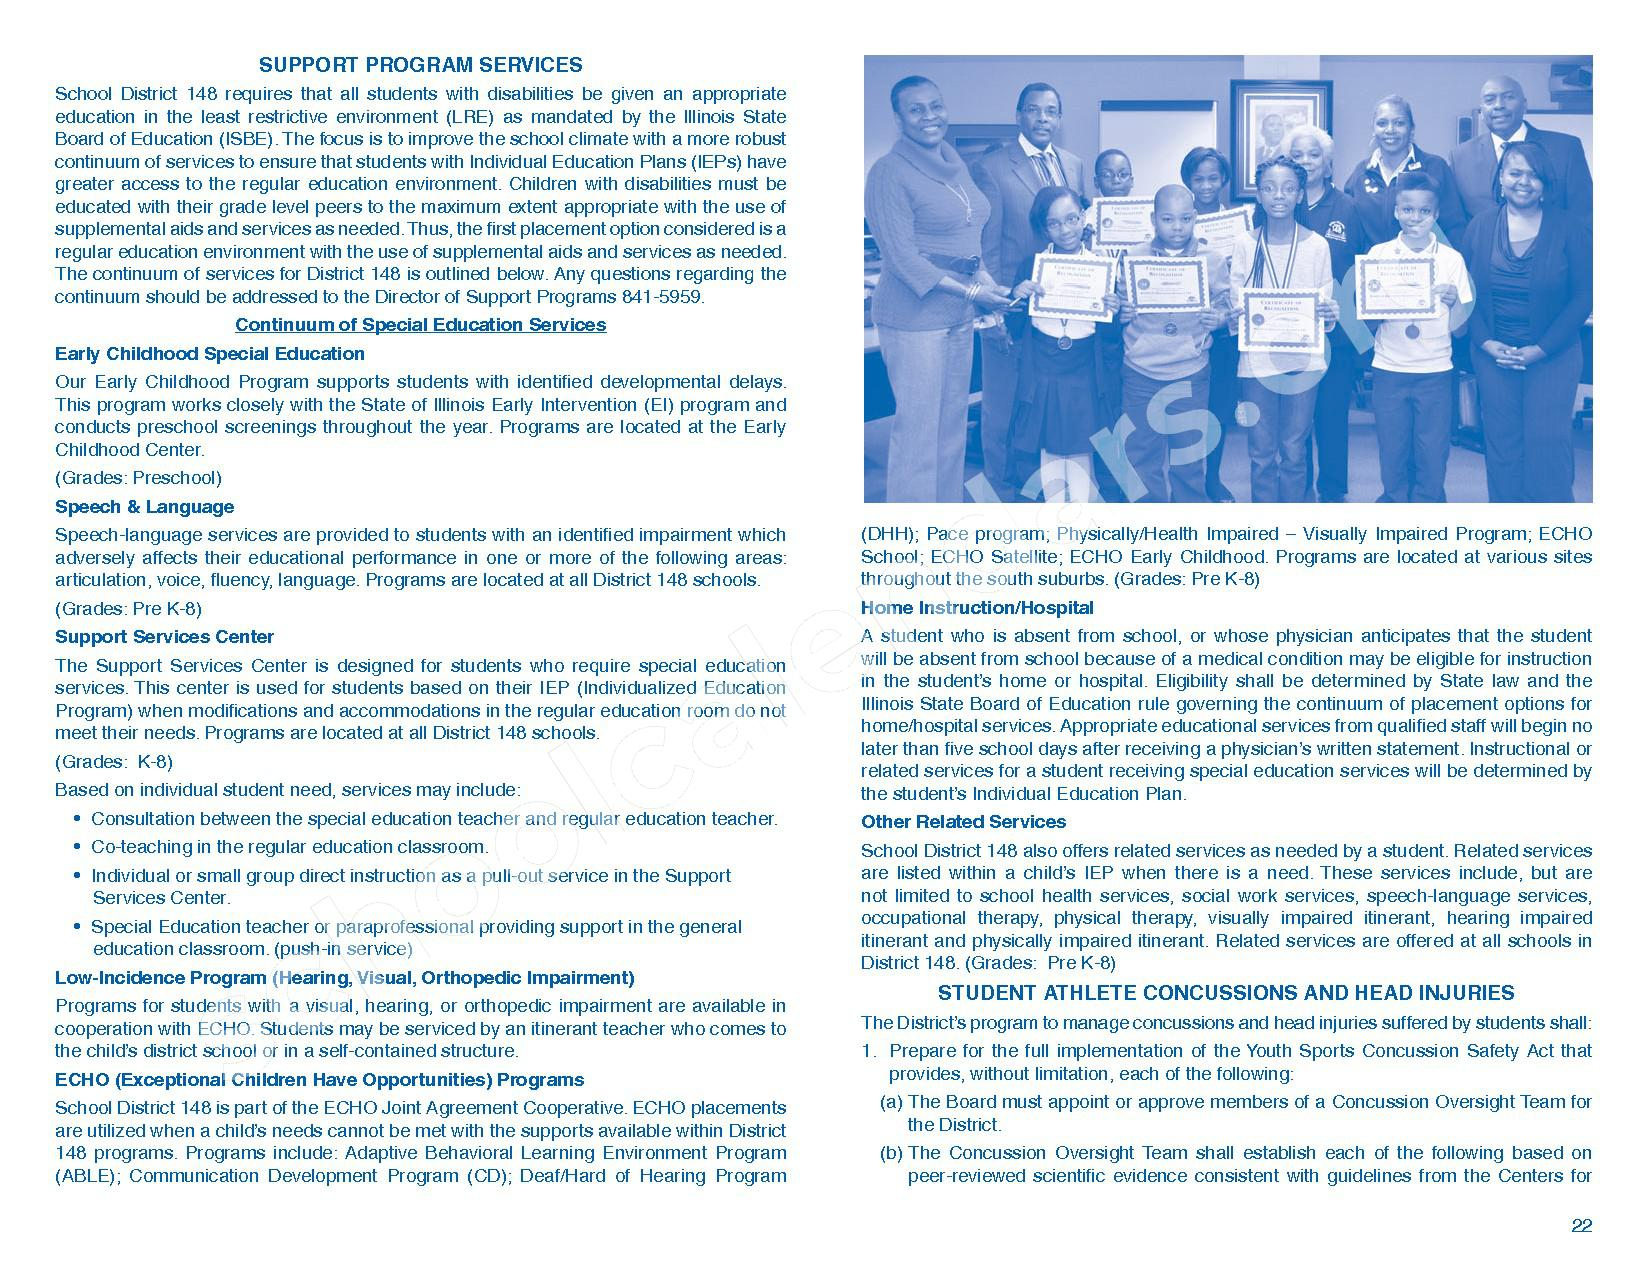 2016 - 2017 Parent/Student Handbook – Roosevelt Elementary School – page 26